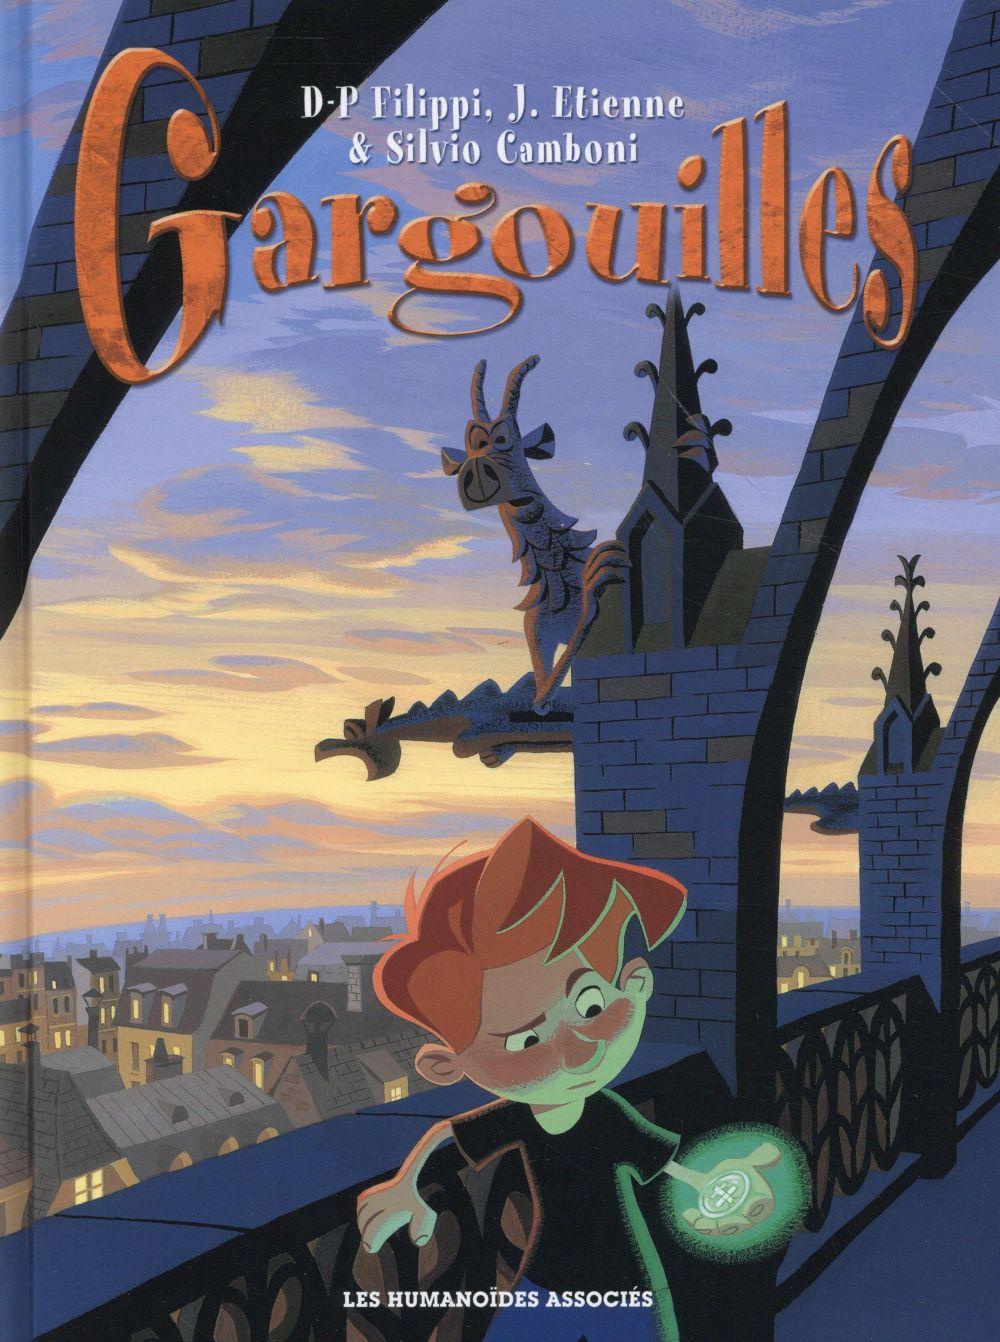 Gargouilles ; INTEGRALE T.1 A T.7